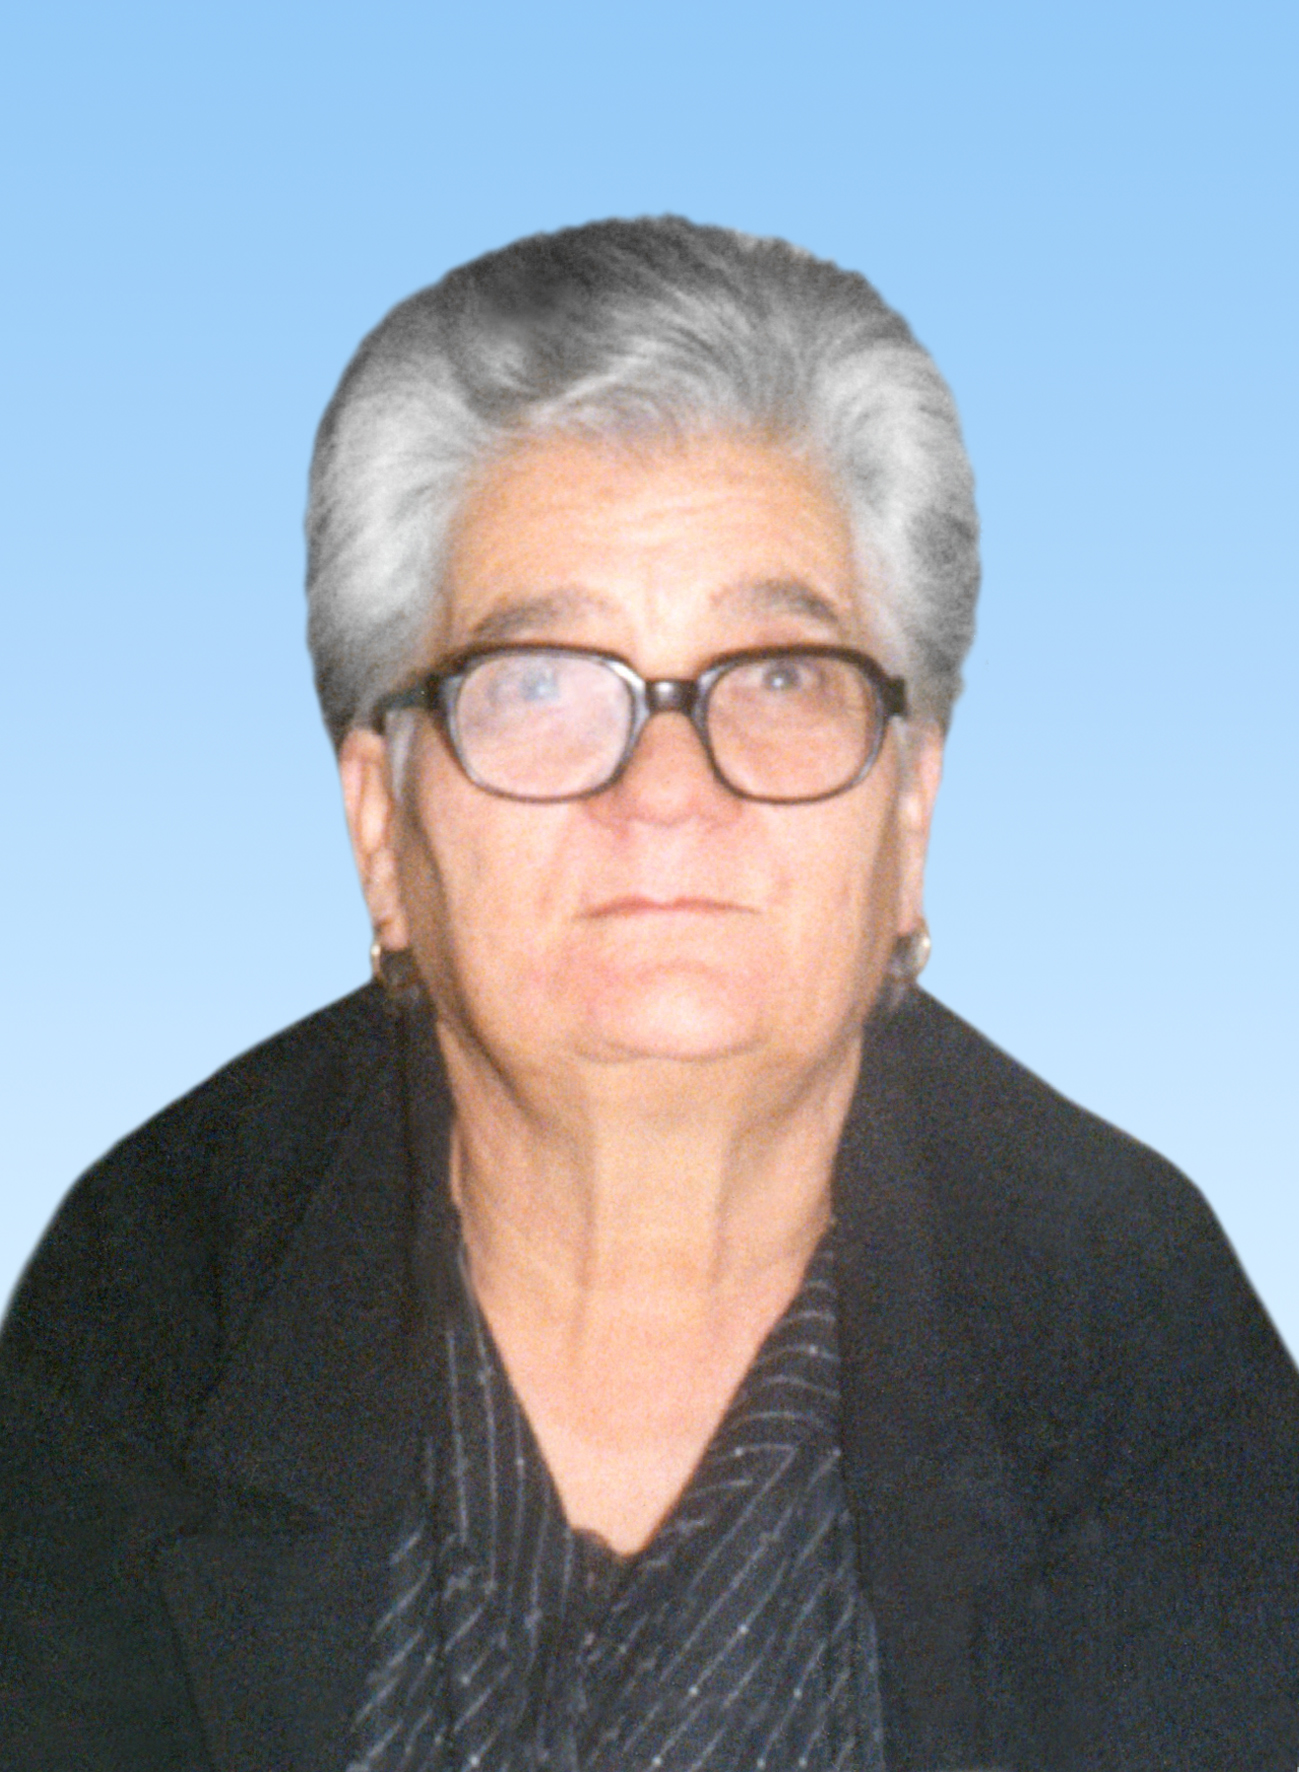 PARCO MARIA